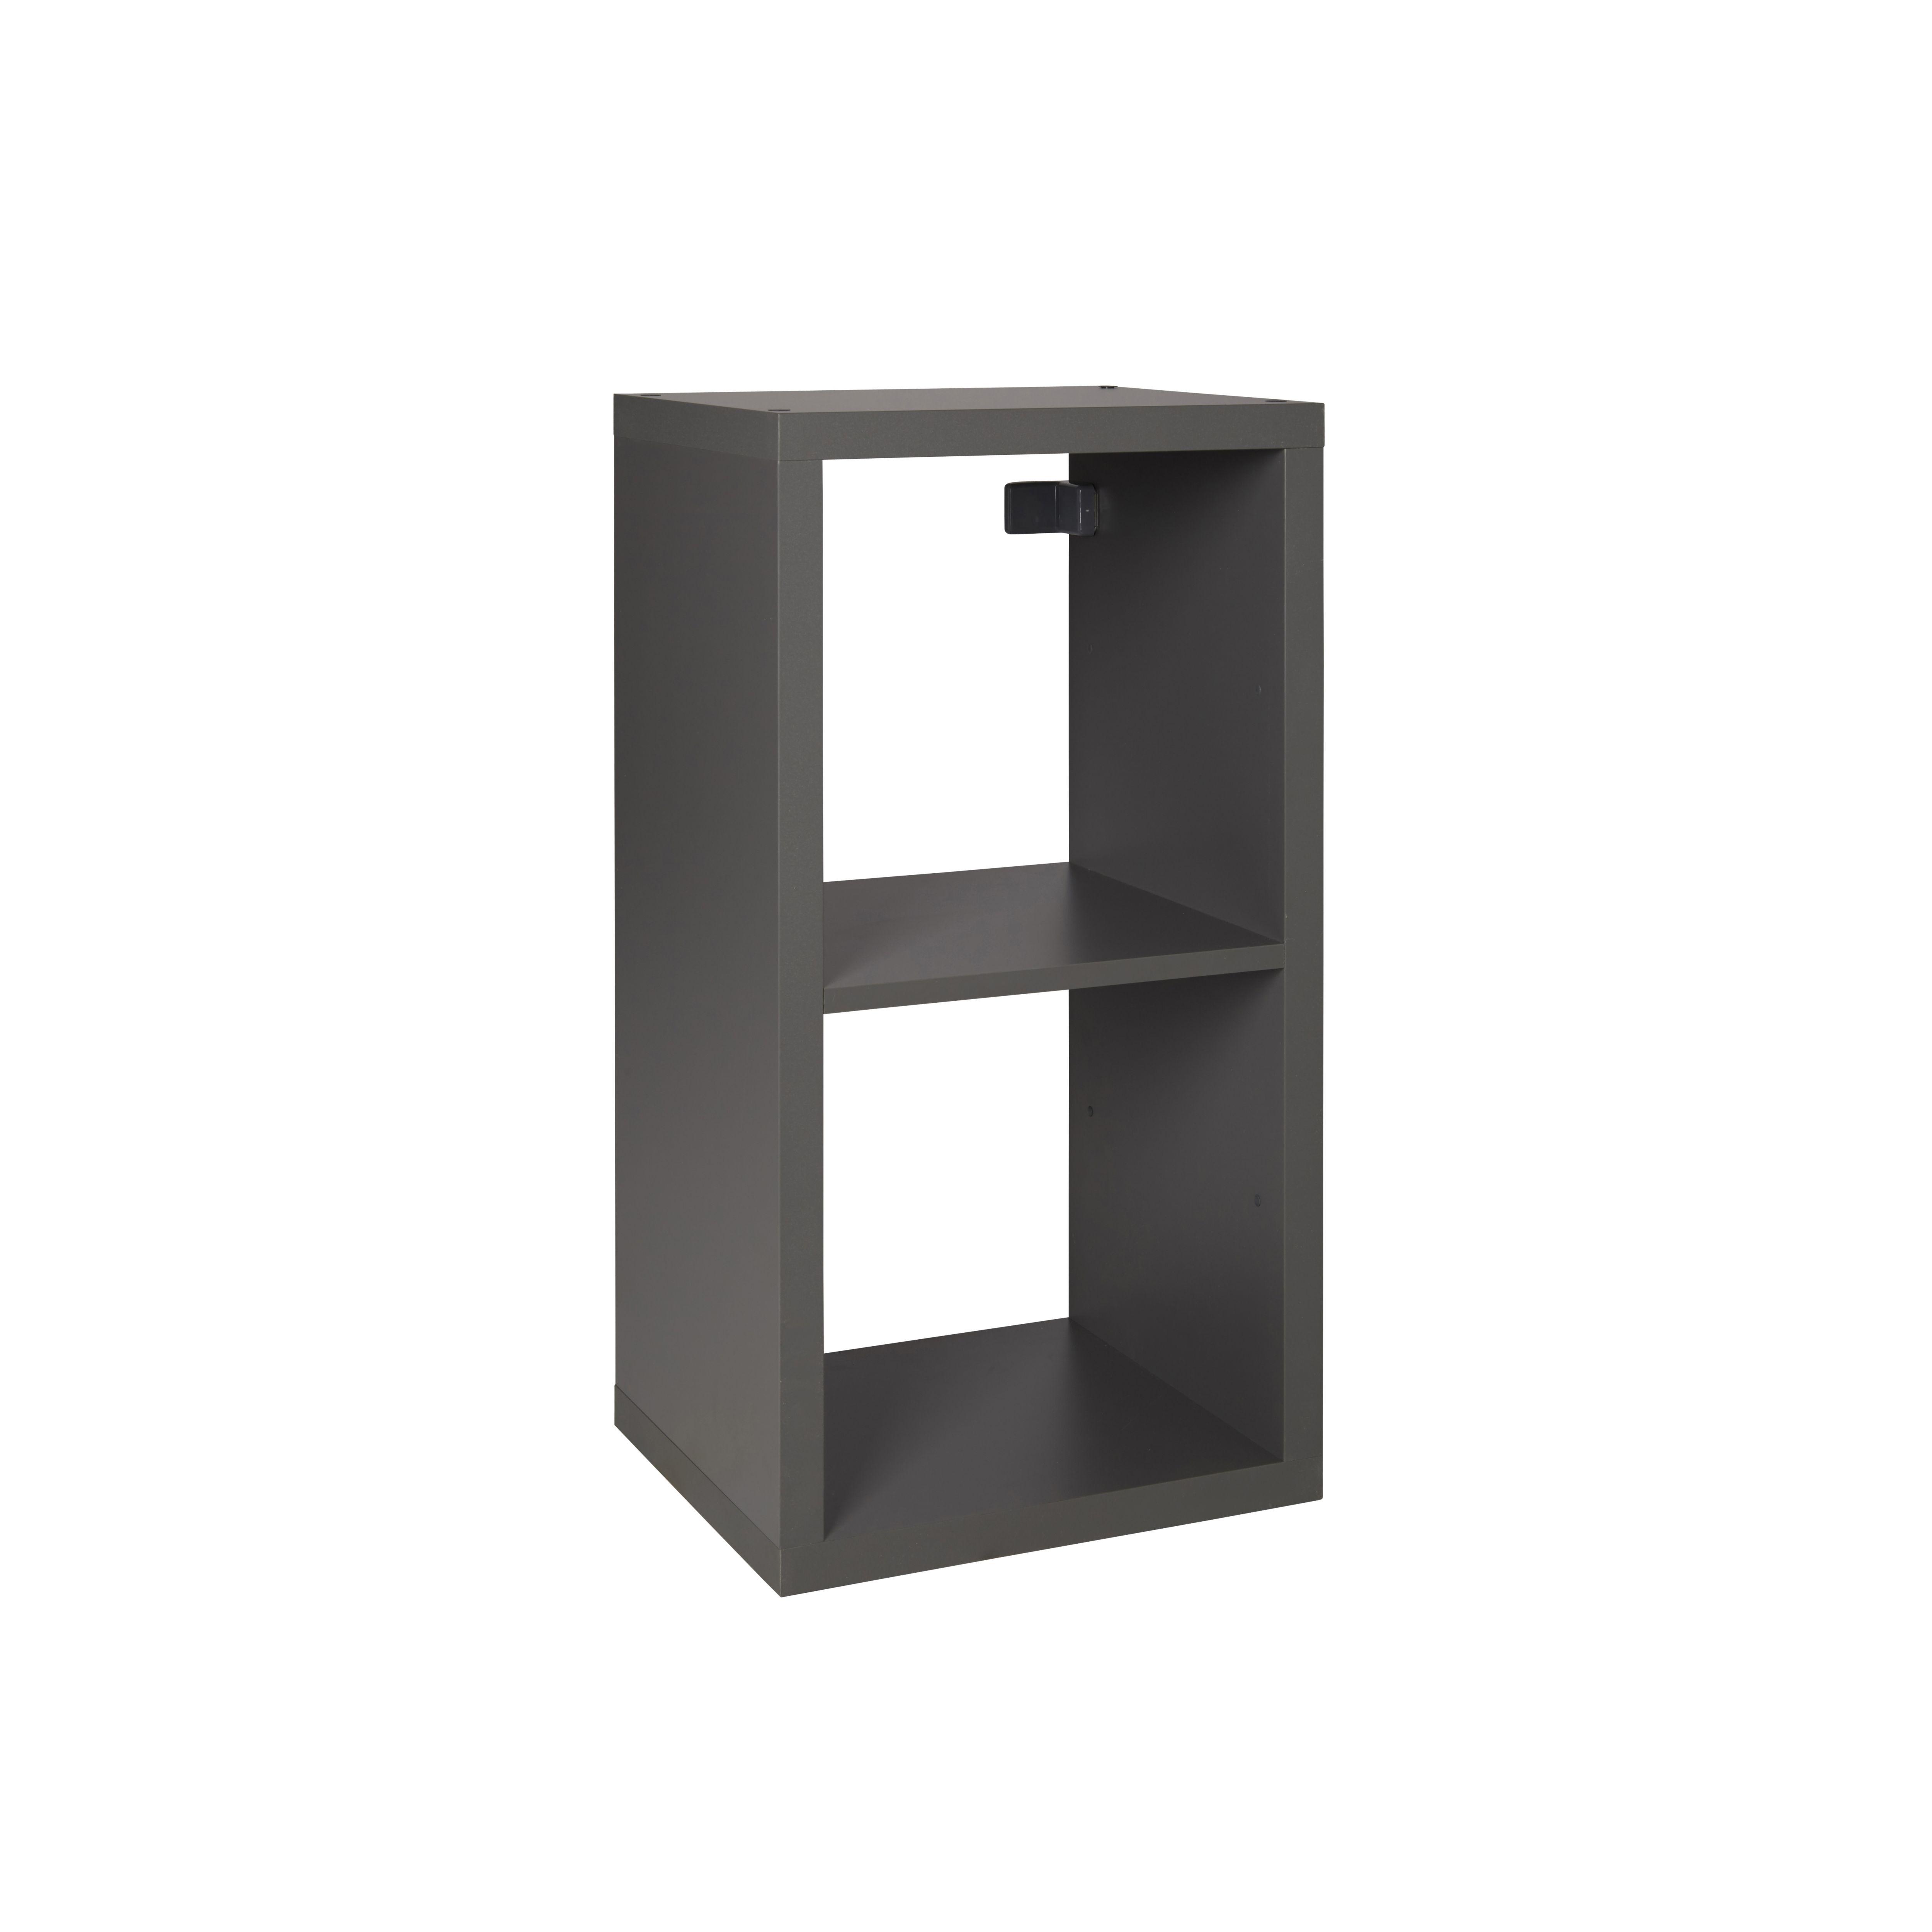 Form Mixxit Grey 2 Cube Shelving Unit (h)740mm (w)360mm